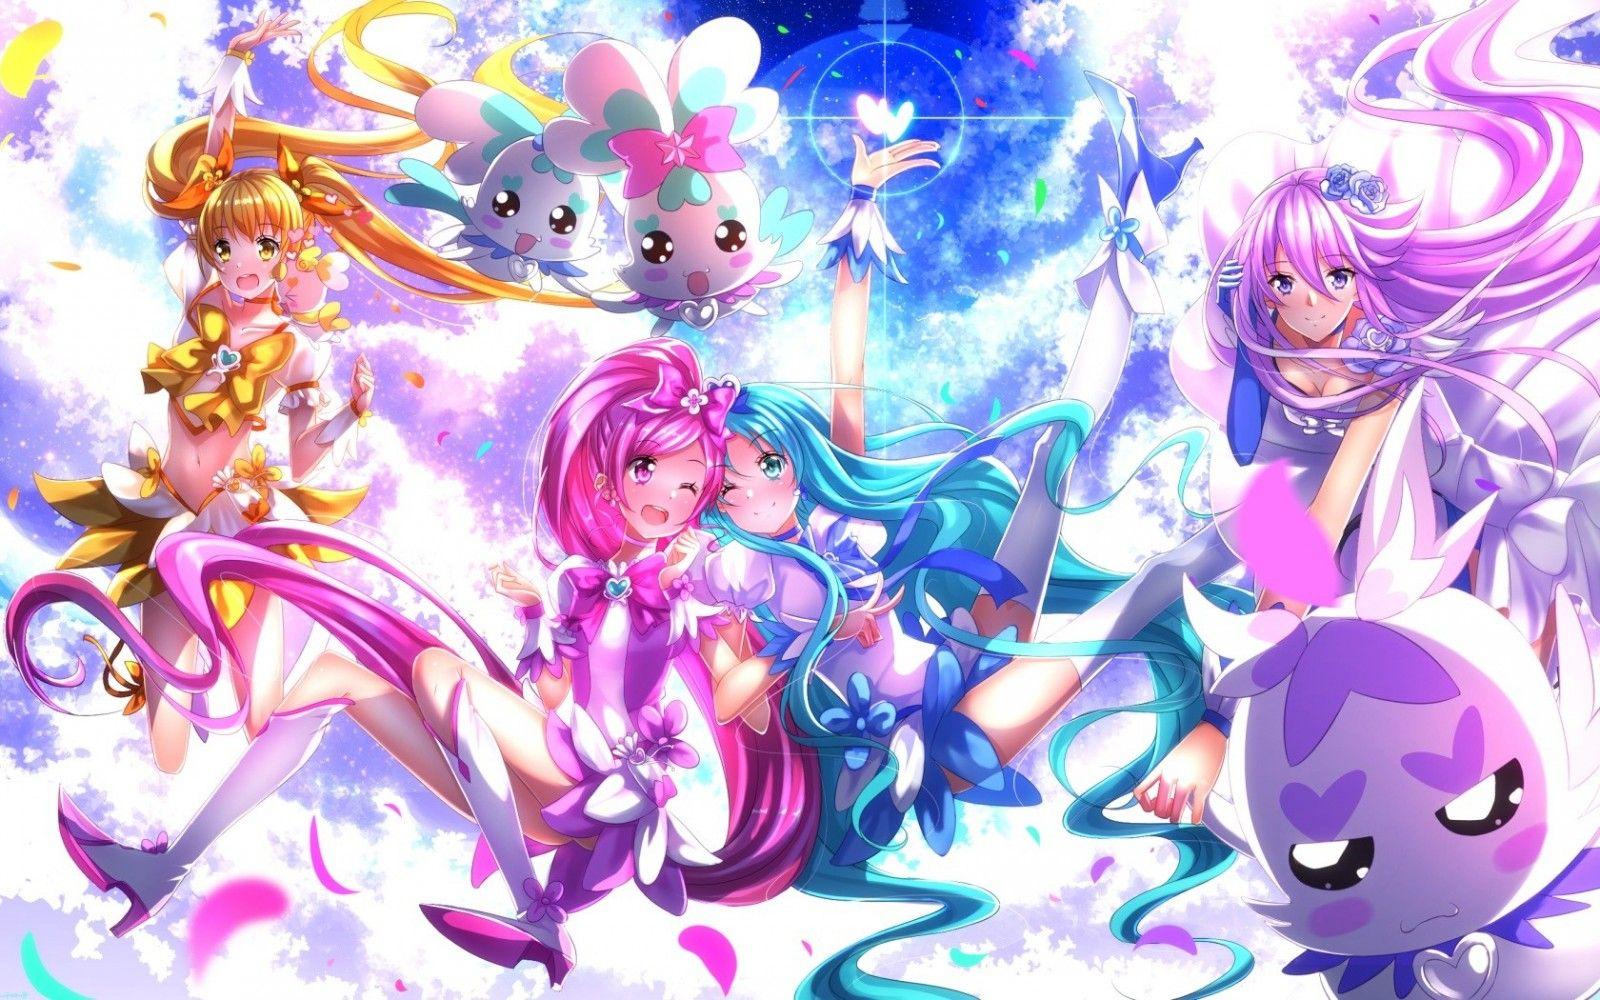 Wallpaper Illustration Blonde Long Hair Anime Girls Yellow